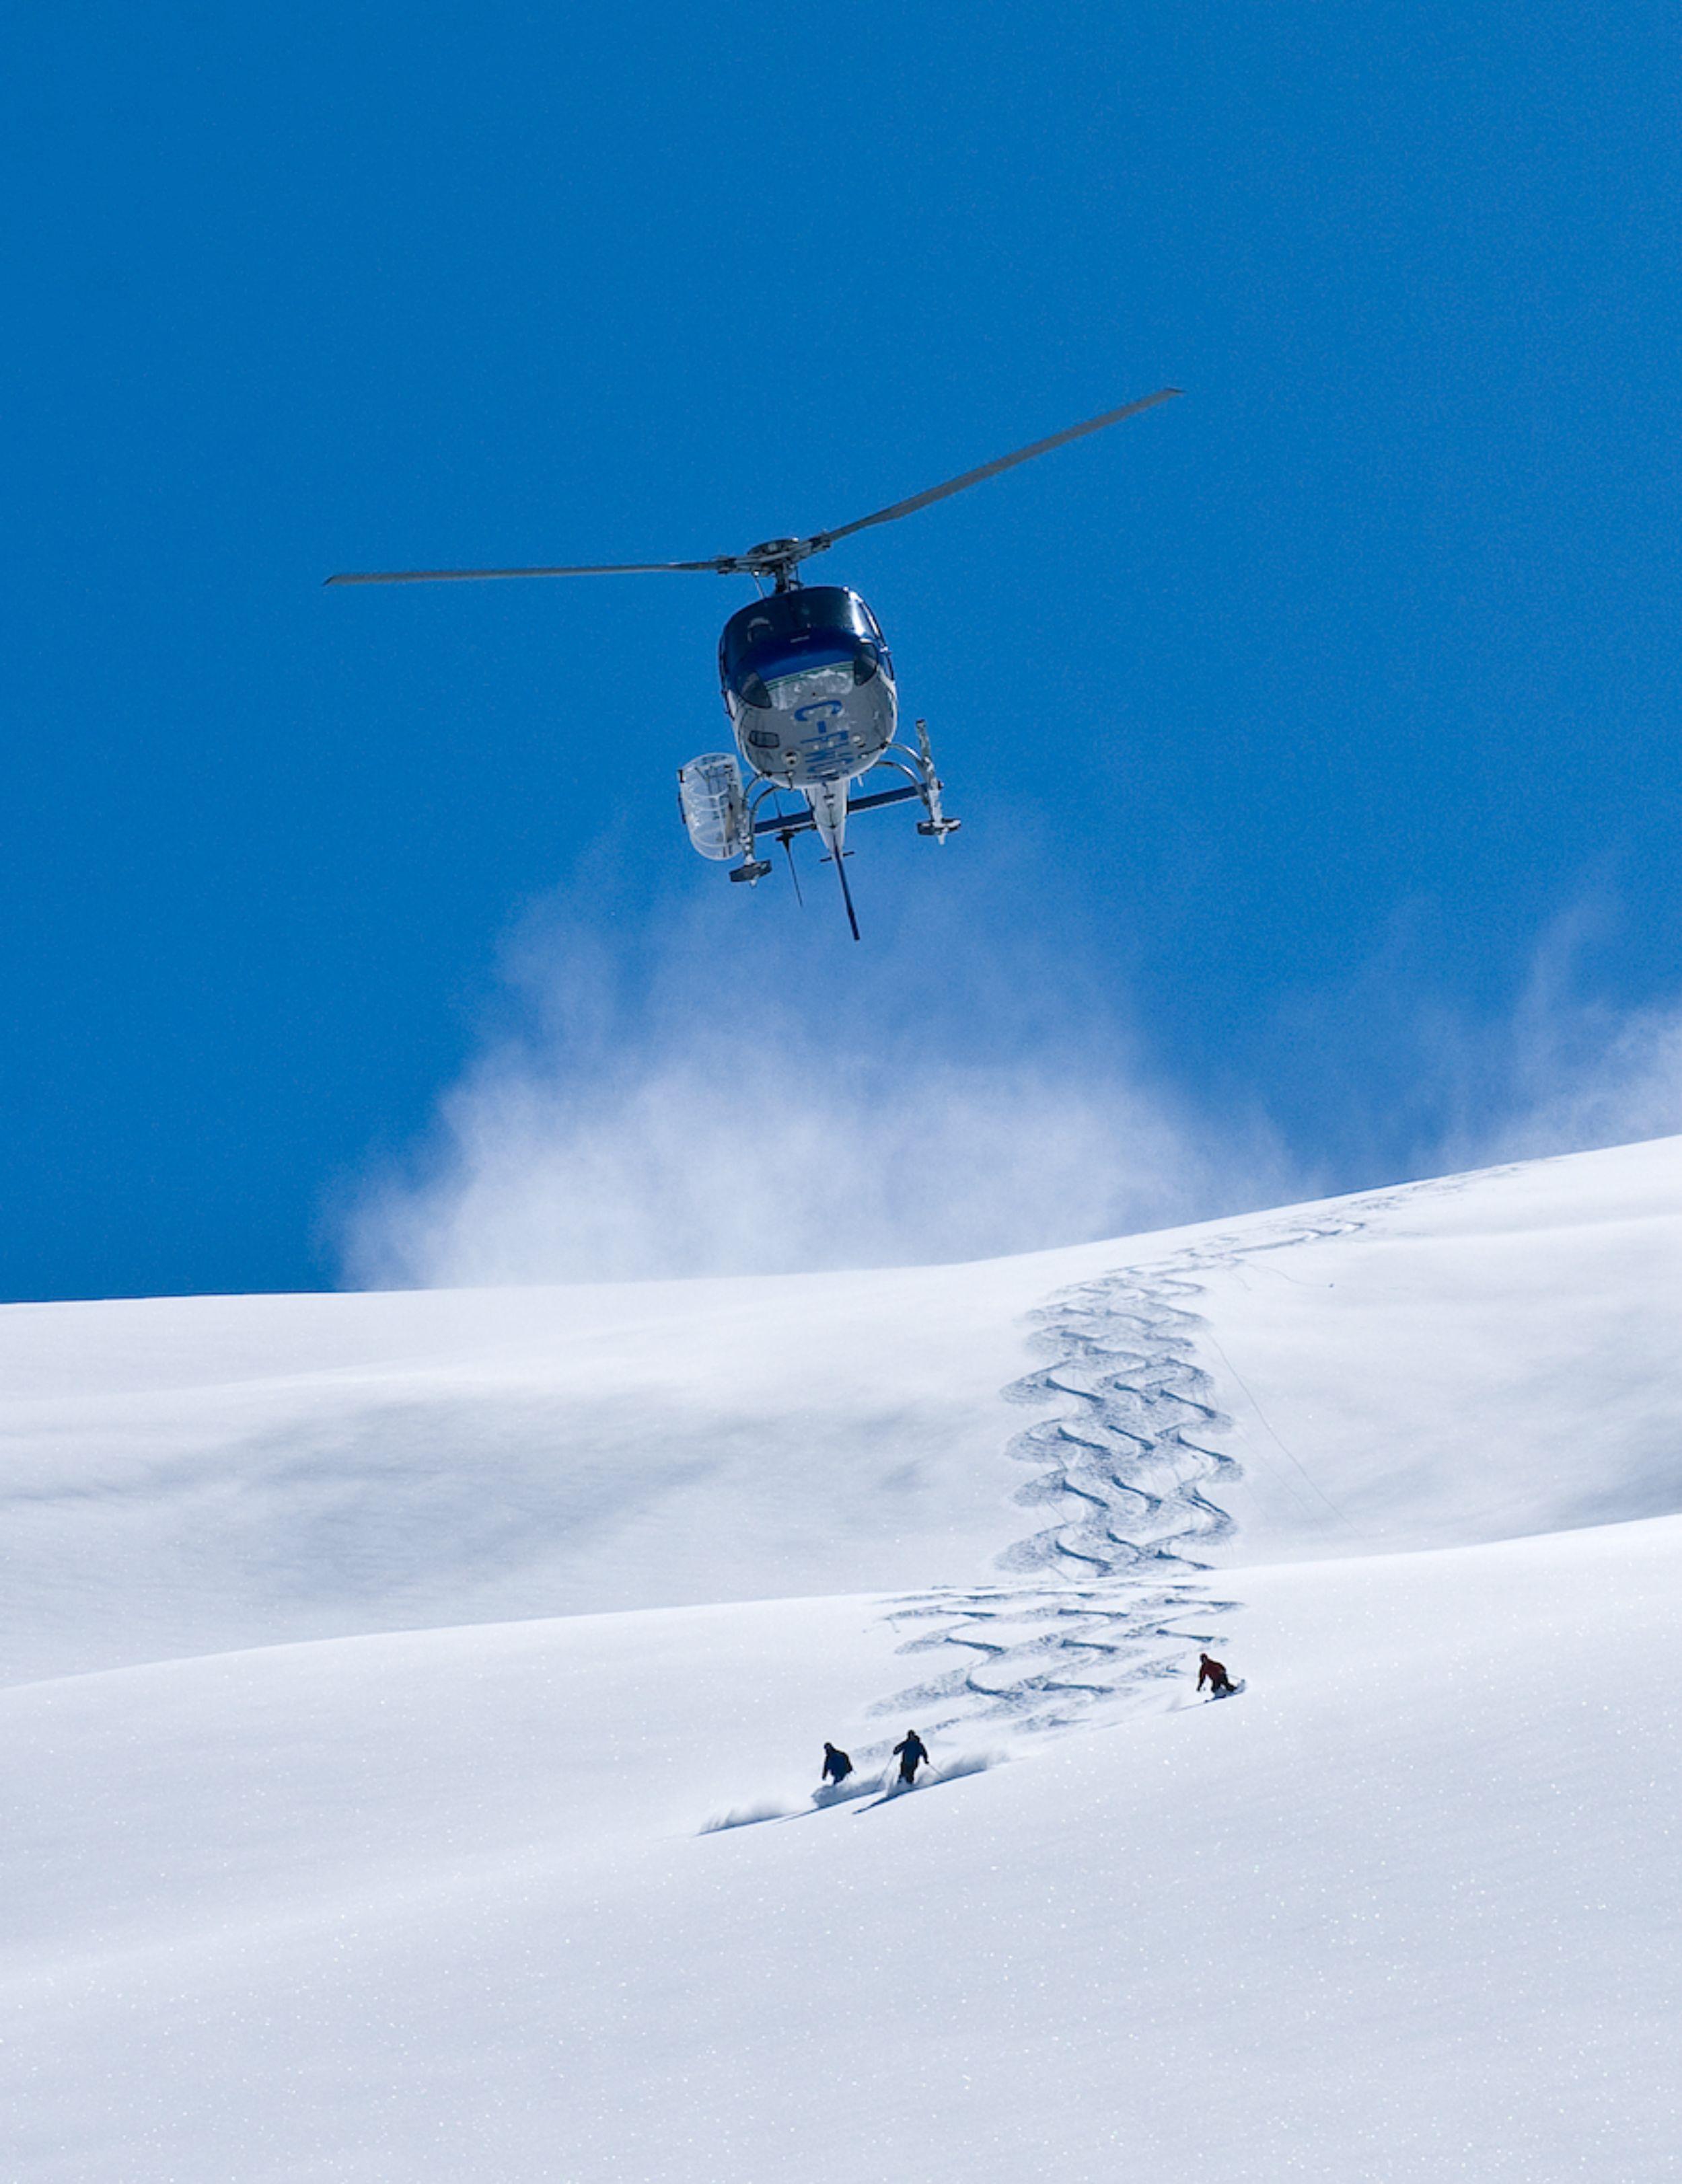 Classic Heli and Skiers photo Eric Berger and Bella Coola Heli Sports copy.jpg